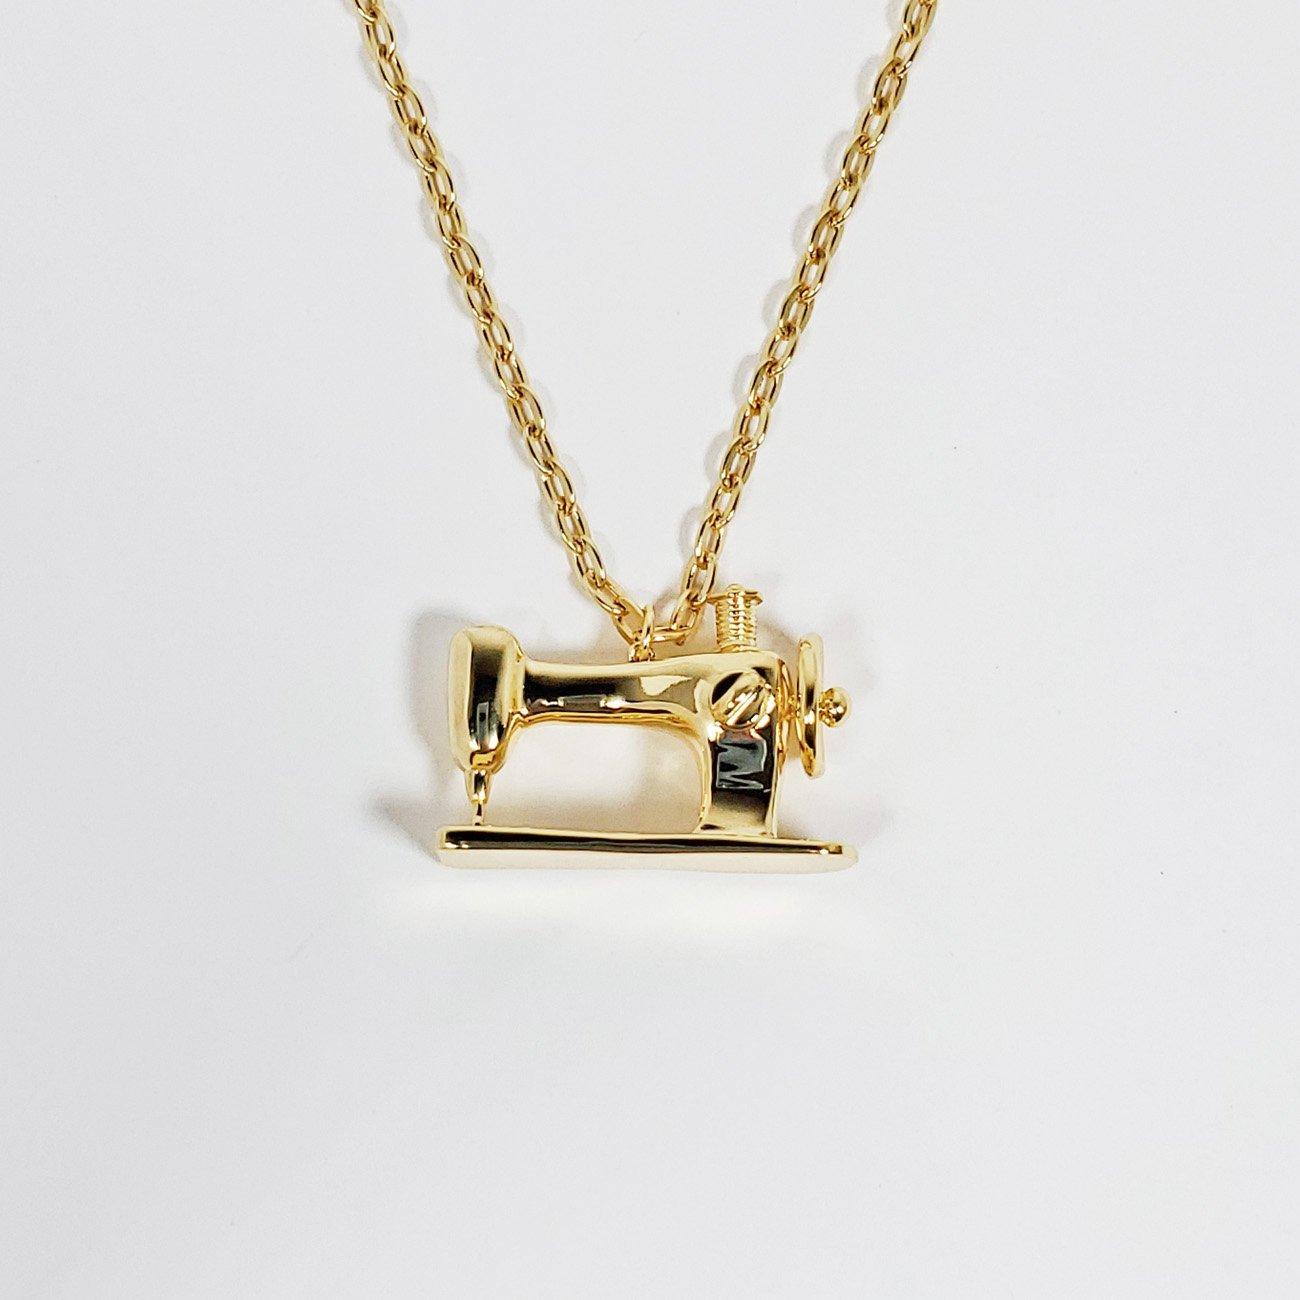 Sewing Machine Pendant Gold